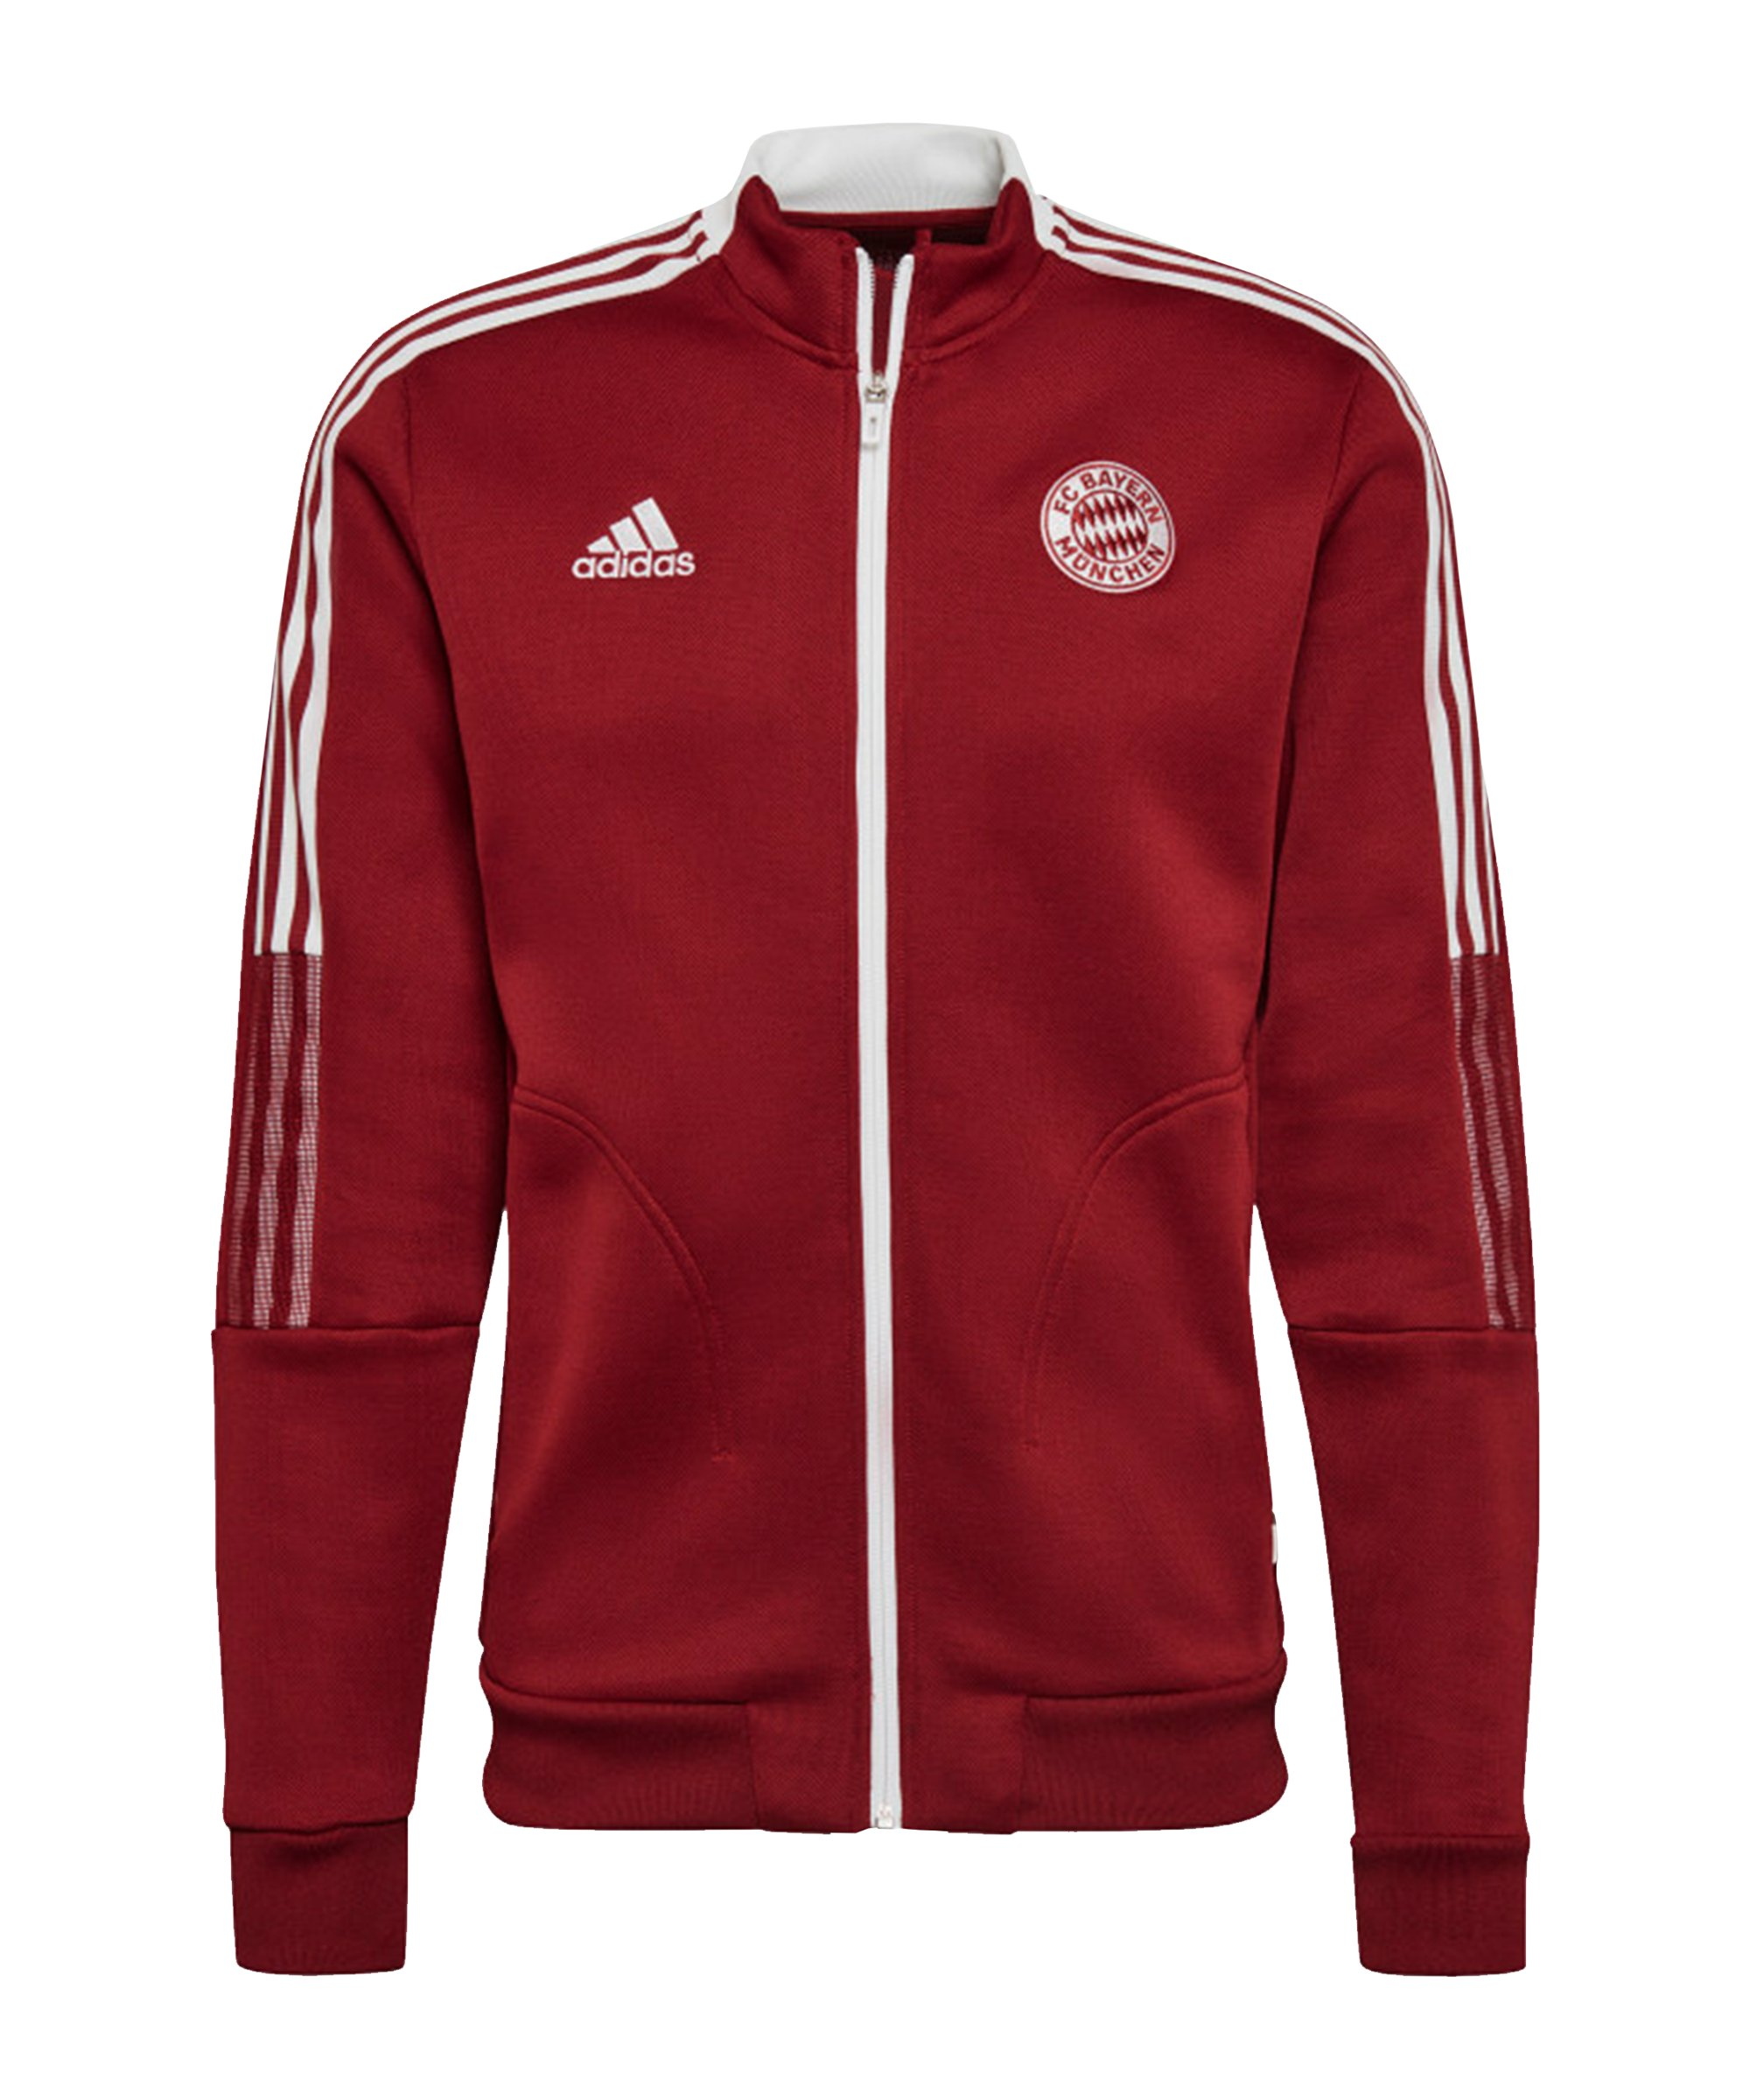 adidas FC Bayern München Anthem Jacke Rot - rot